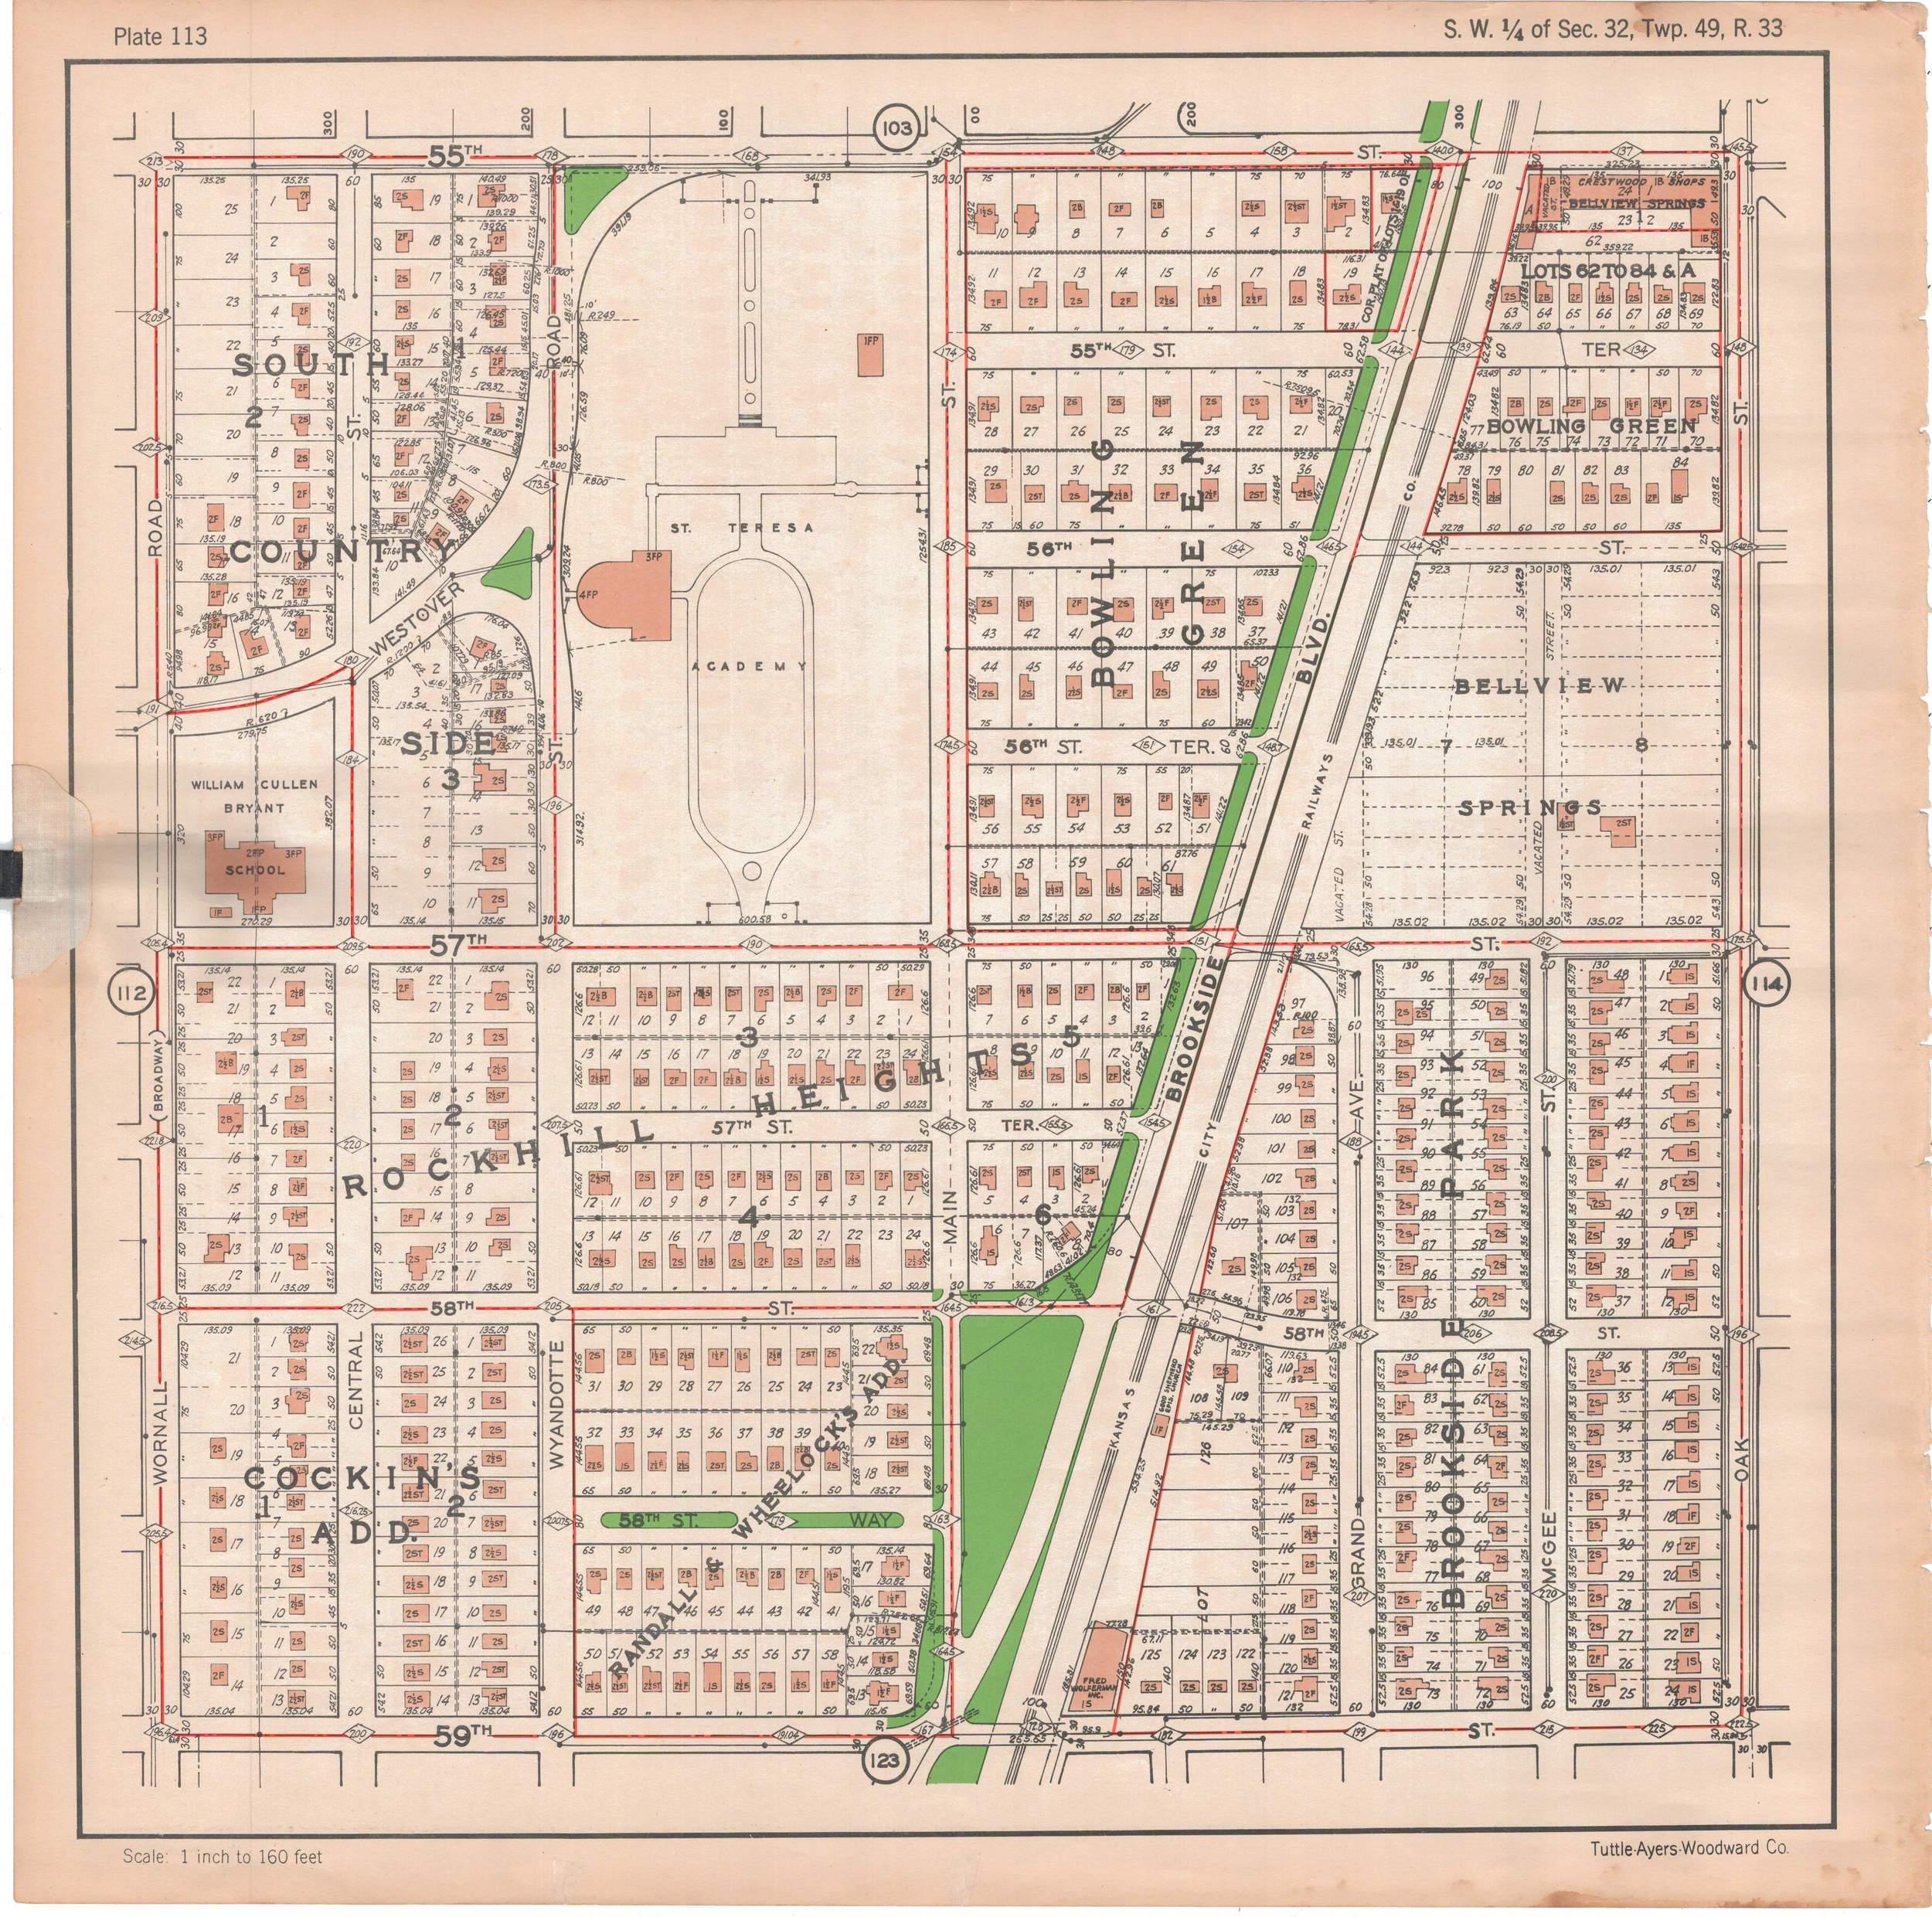 1925 TUTTLE_AYERS_Plate 113.JPG